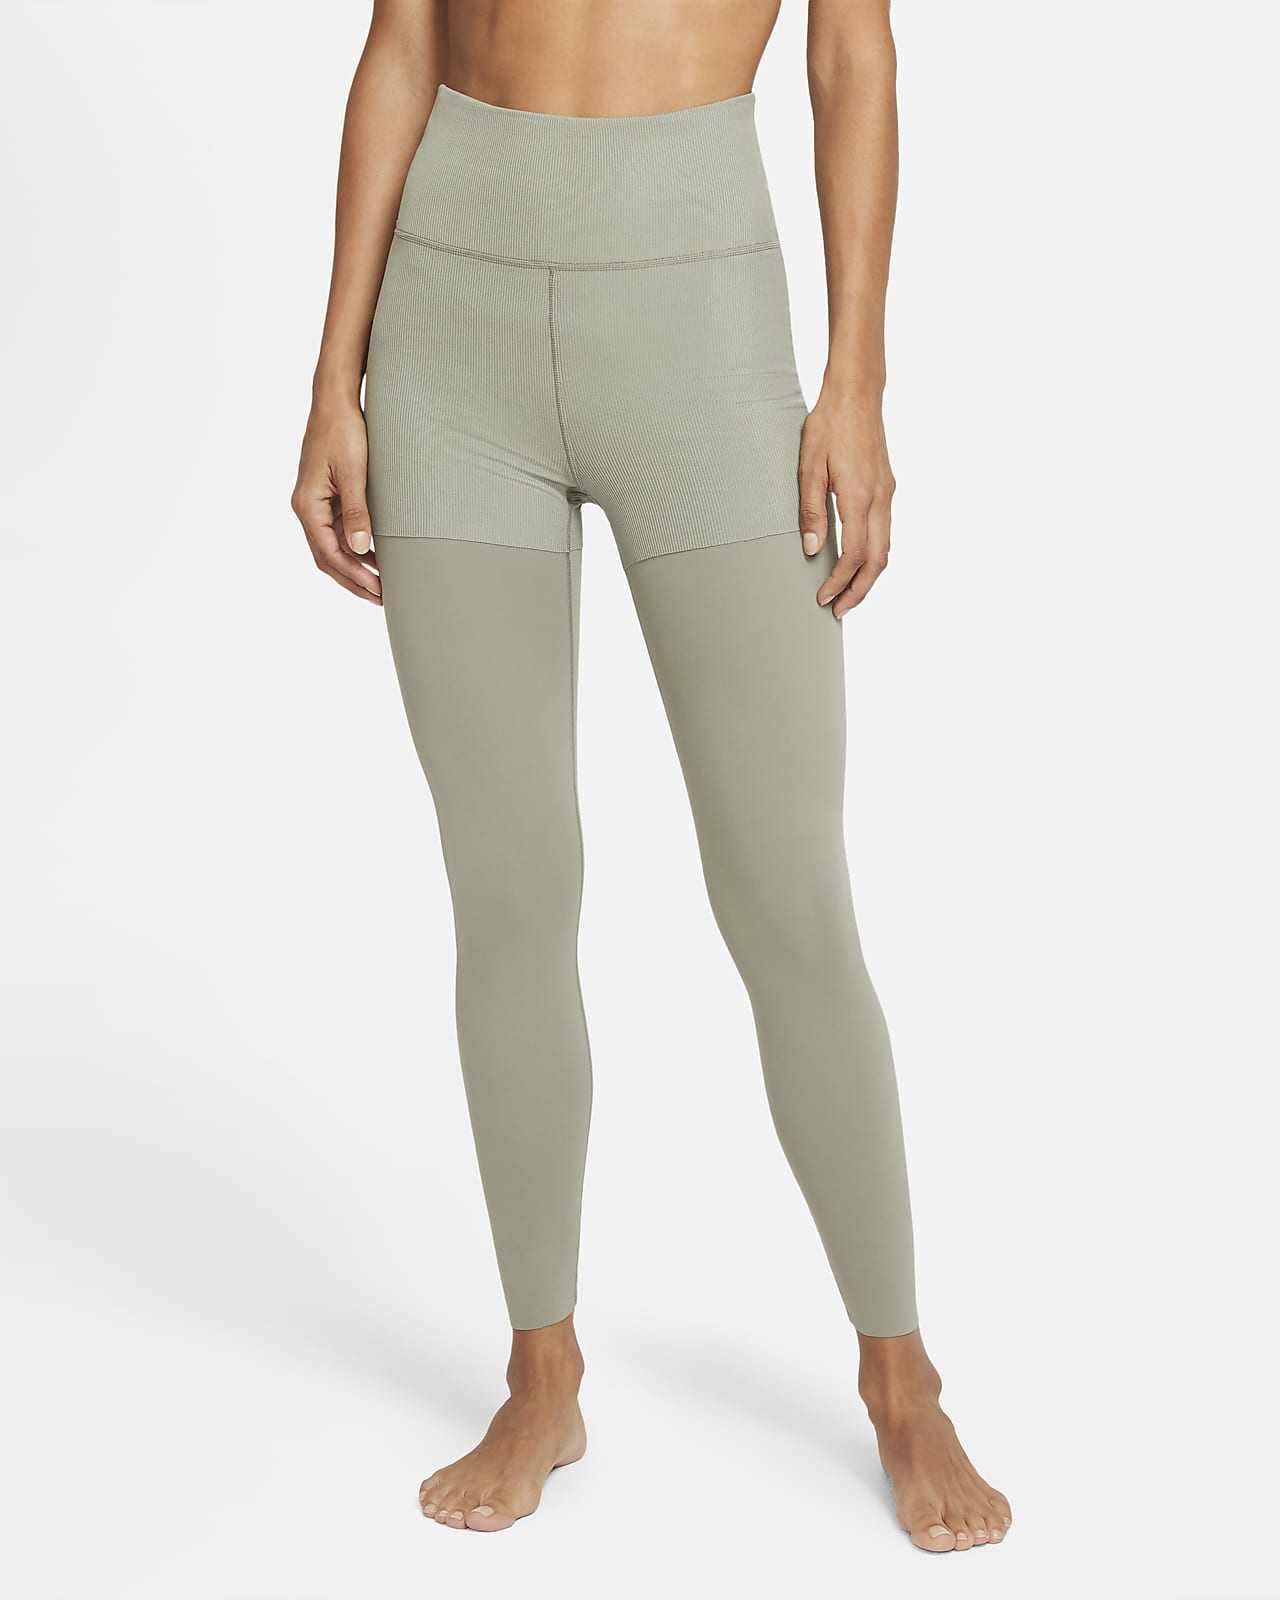 Nike Yoga Luxe Layered Leggings de 7/8 - Mujer